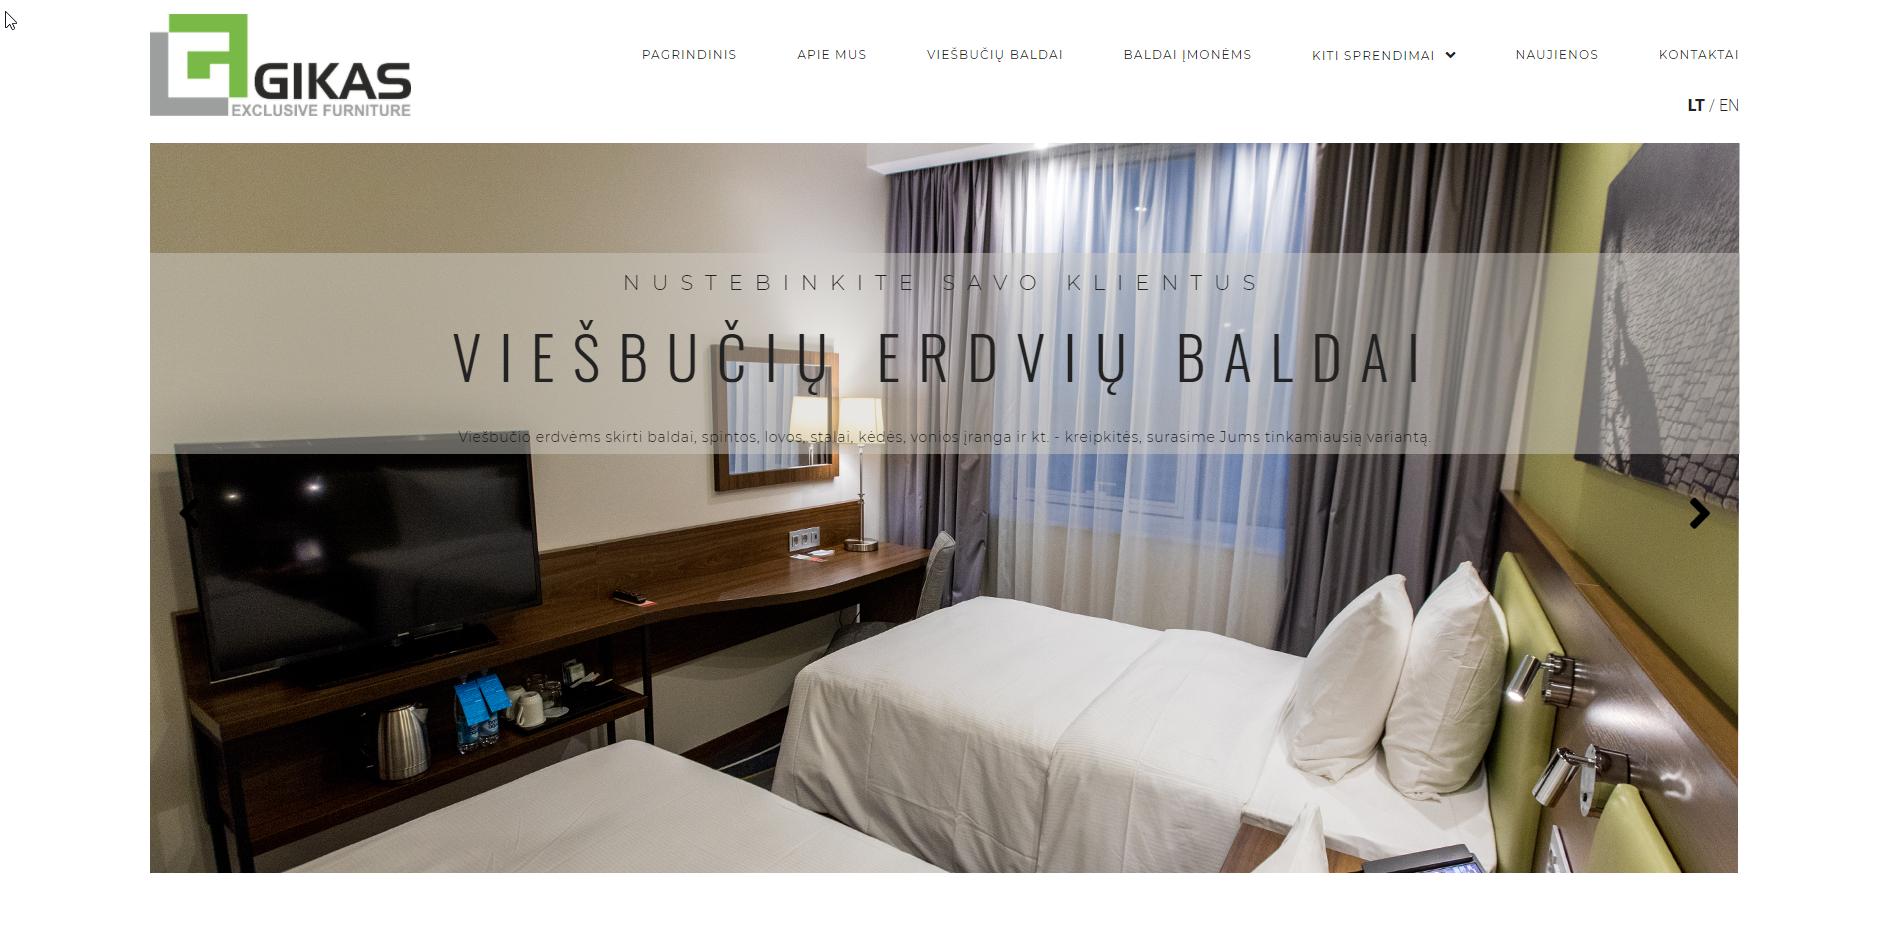 GIKAS – Exclusive Furniture